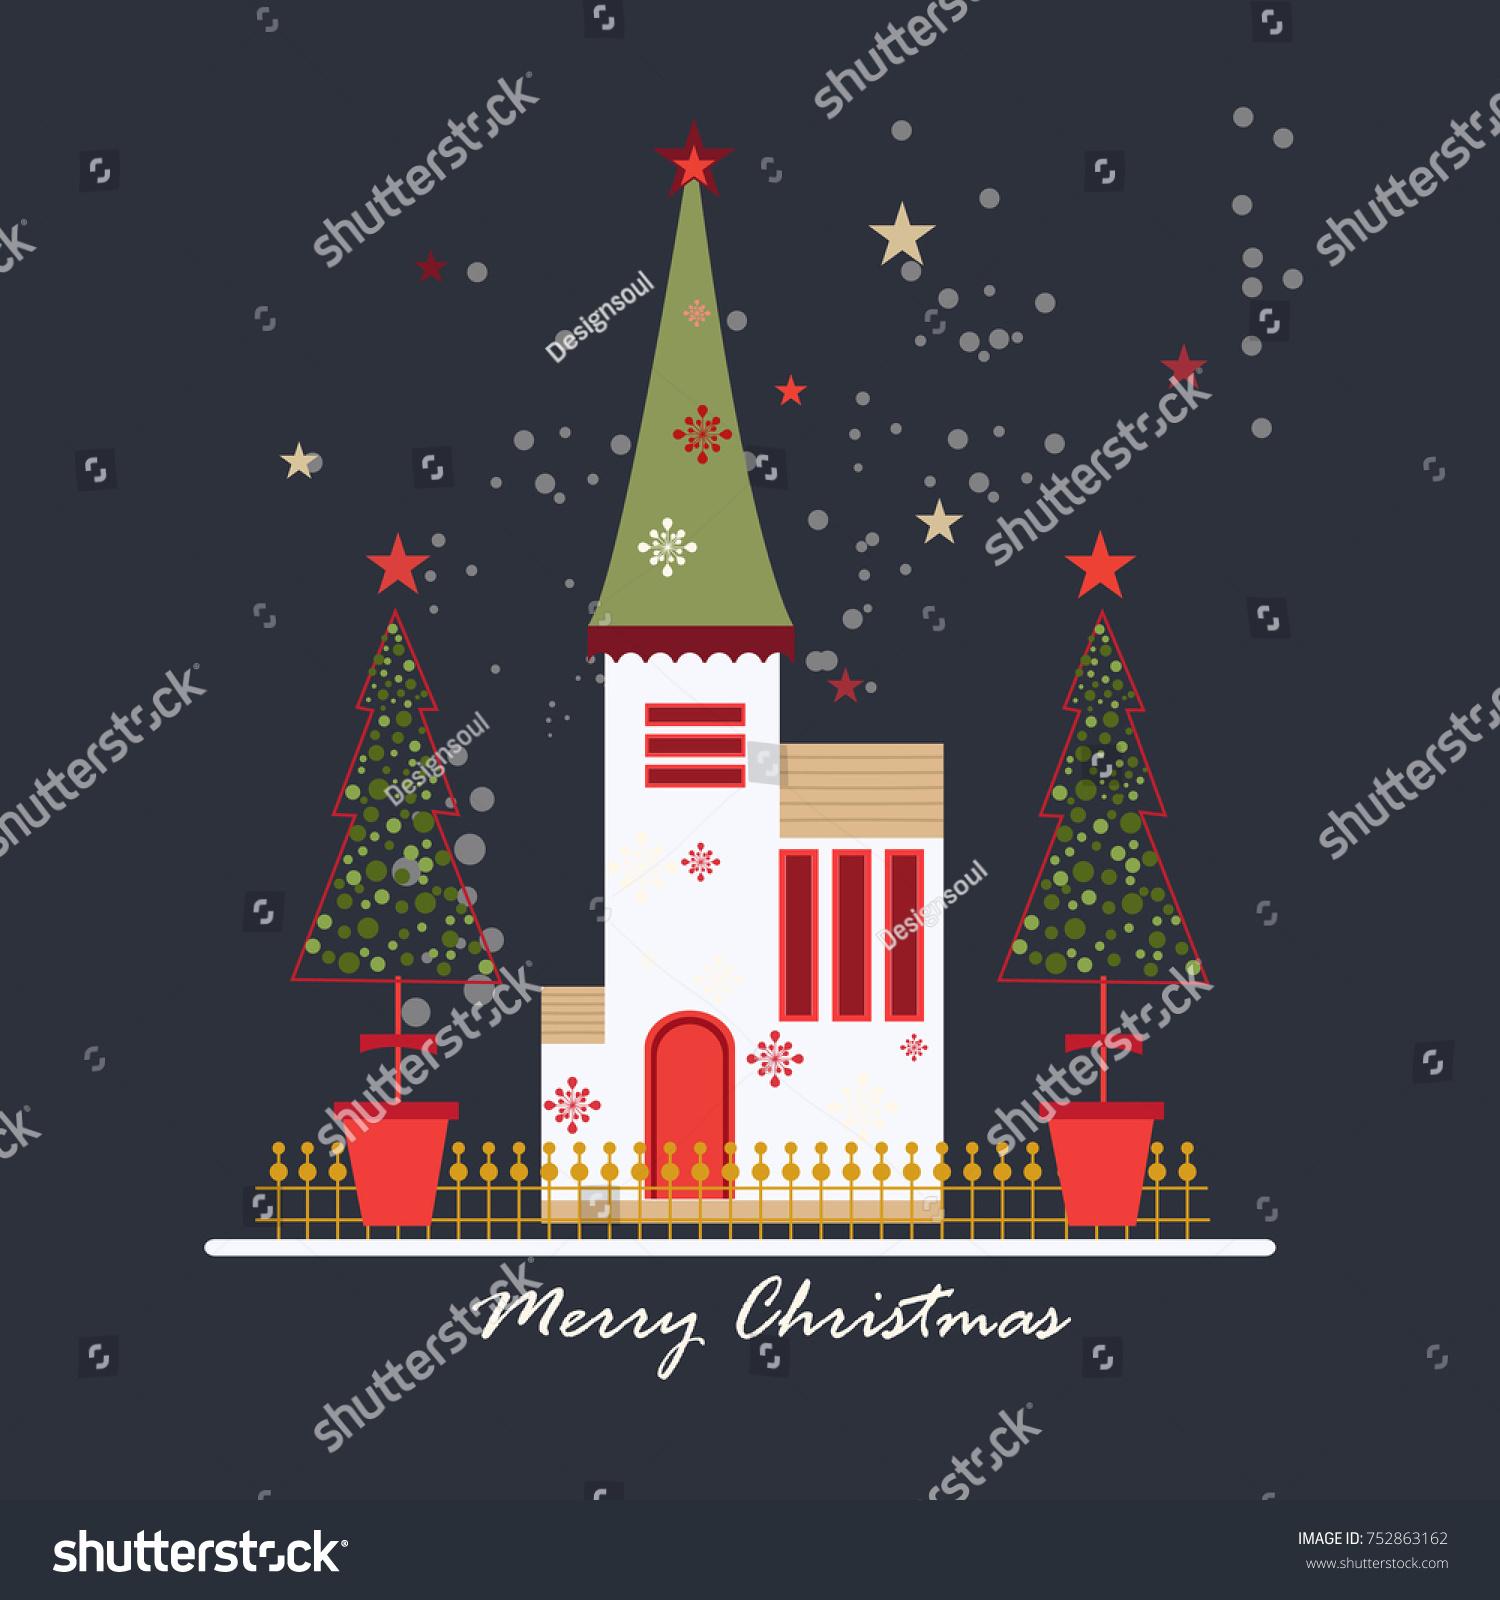 Christmas Day Christmas Day Anniversary Birth Jesus Stock Vector ...